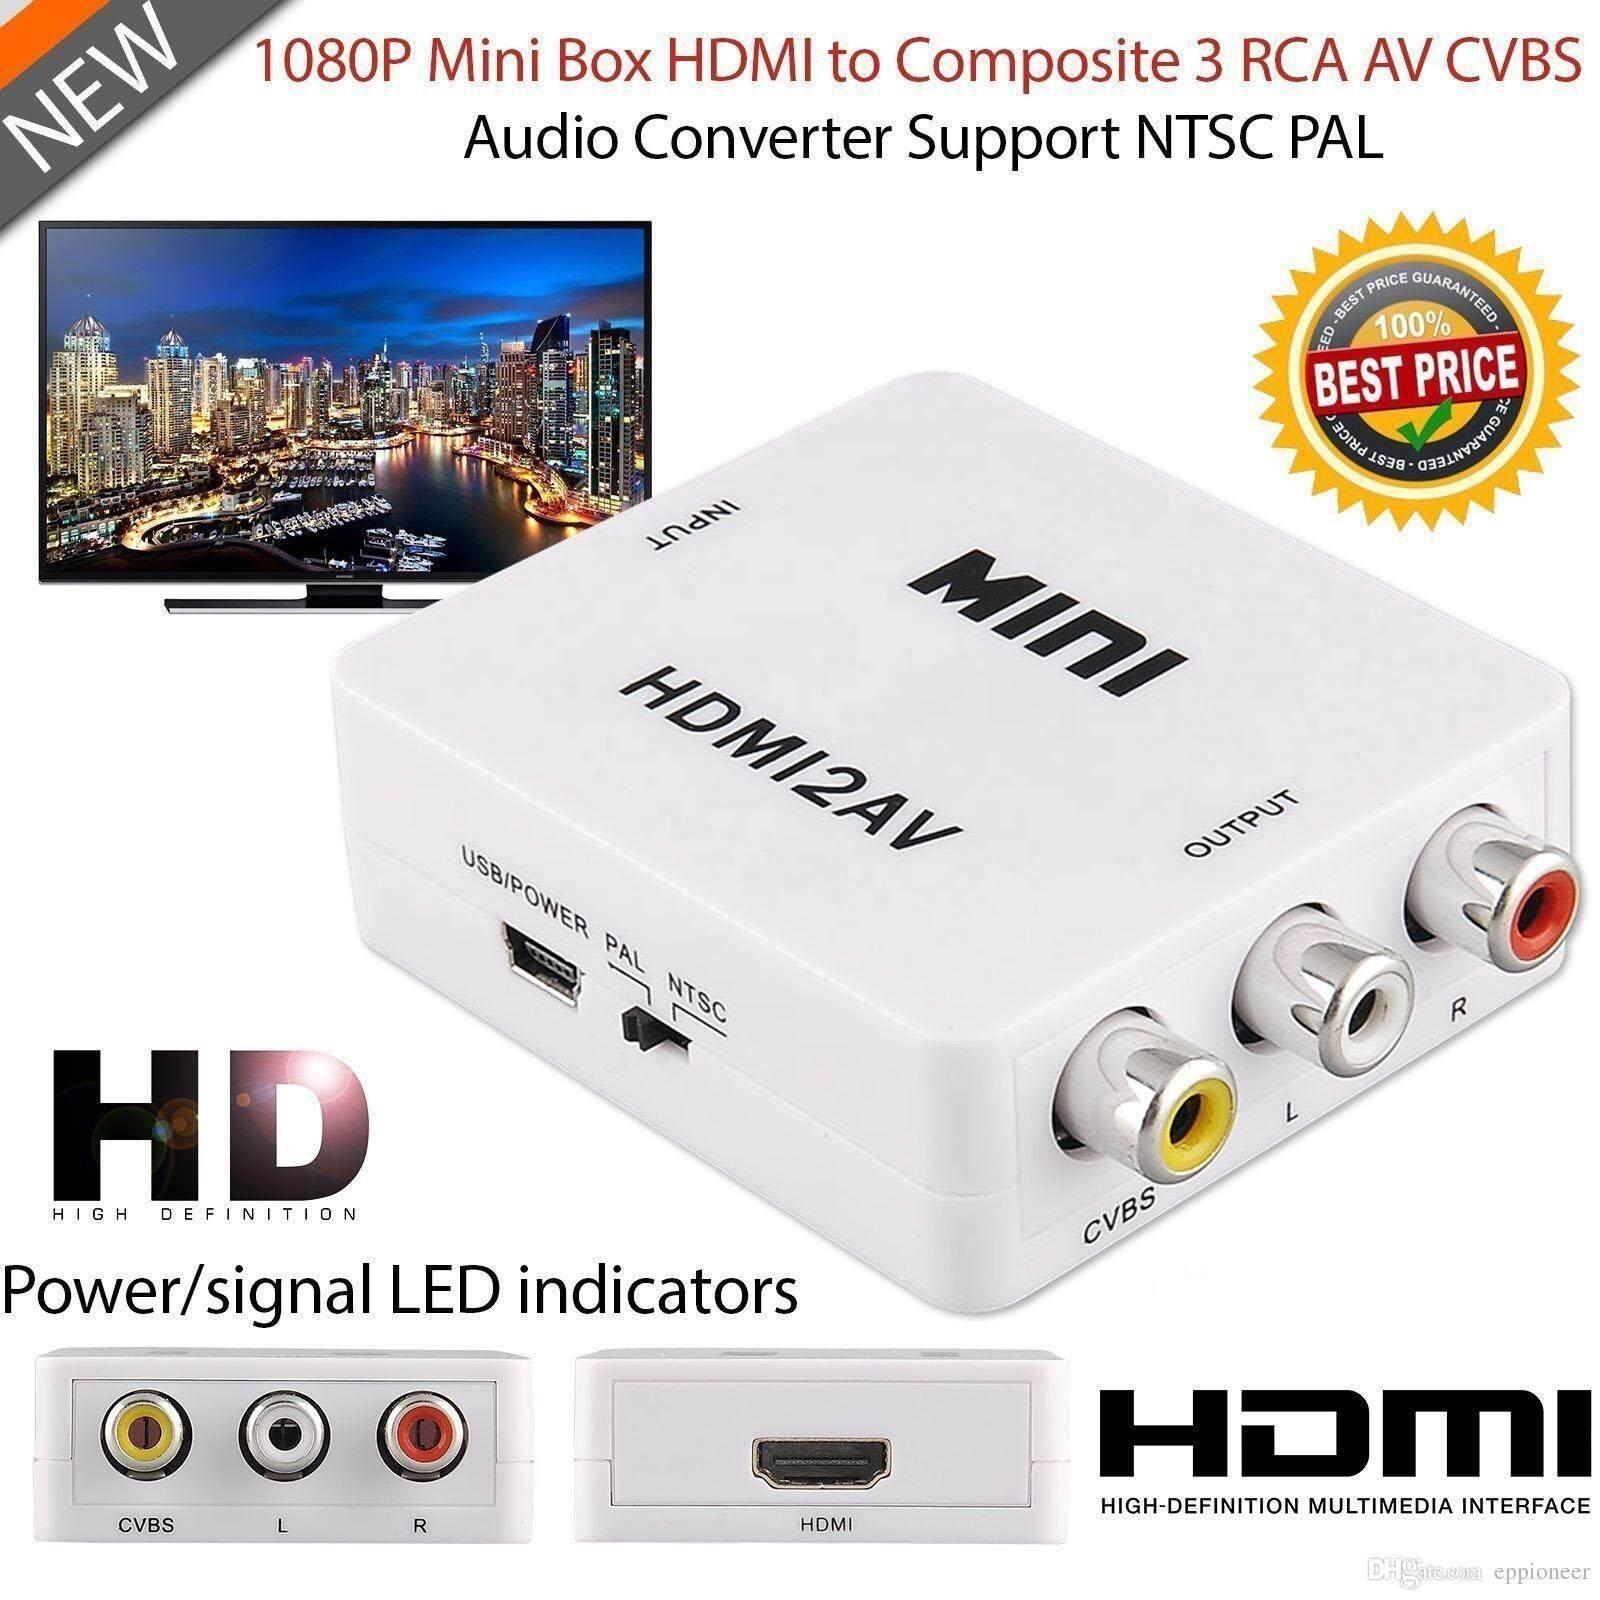 Portable 3 Way Audio Video Switch Splitter Selector Av Box Digital Hdmi To Rca Composite Cvbs Adapter Converter 720p 1080p White Intl